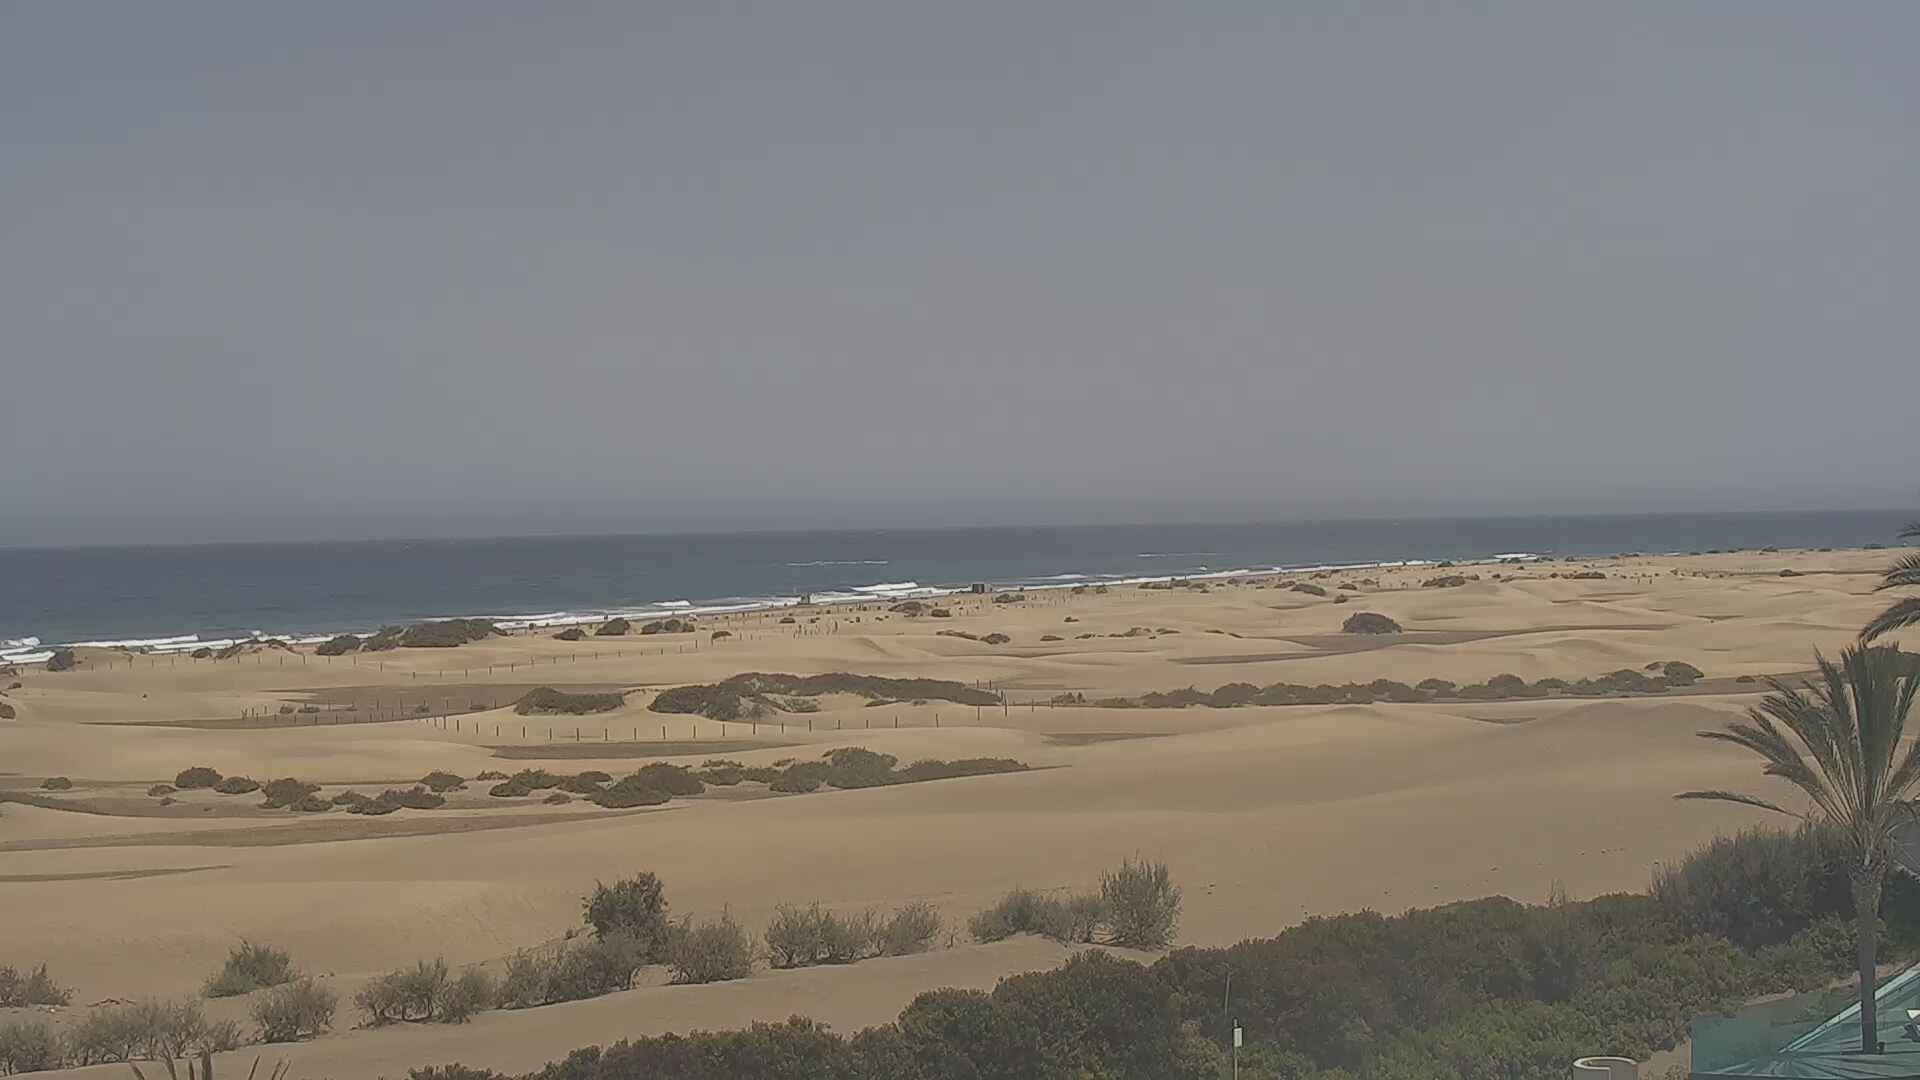 Playa del Ingles (Gran Canaria) Sat. 15:36